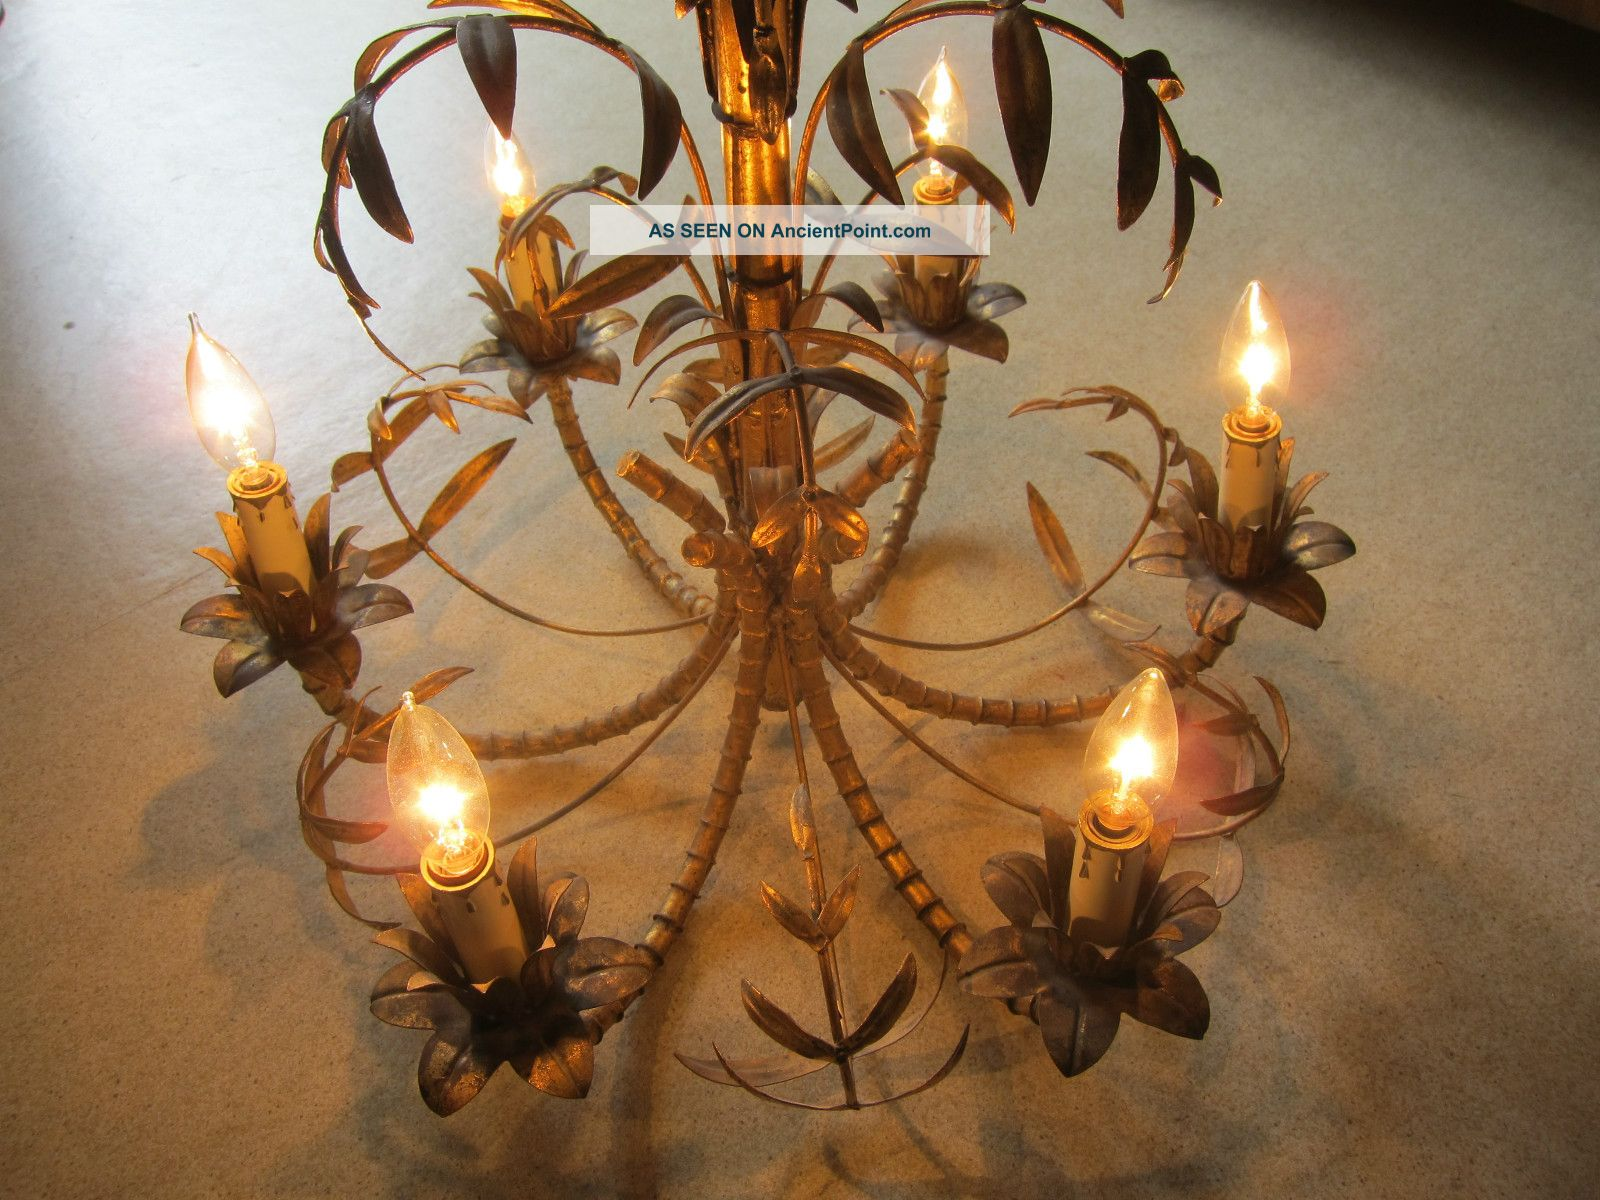 Antique tole chandelier chandelier designs antique tole chandelier designs arubaitofo Image collections